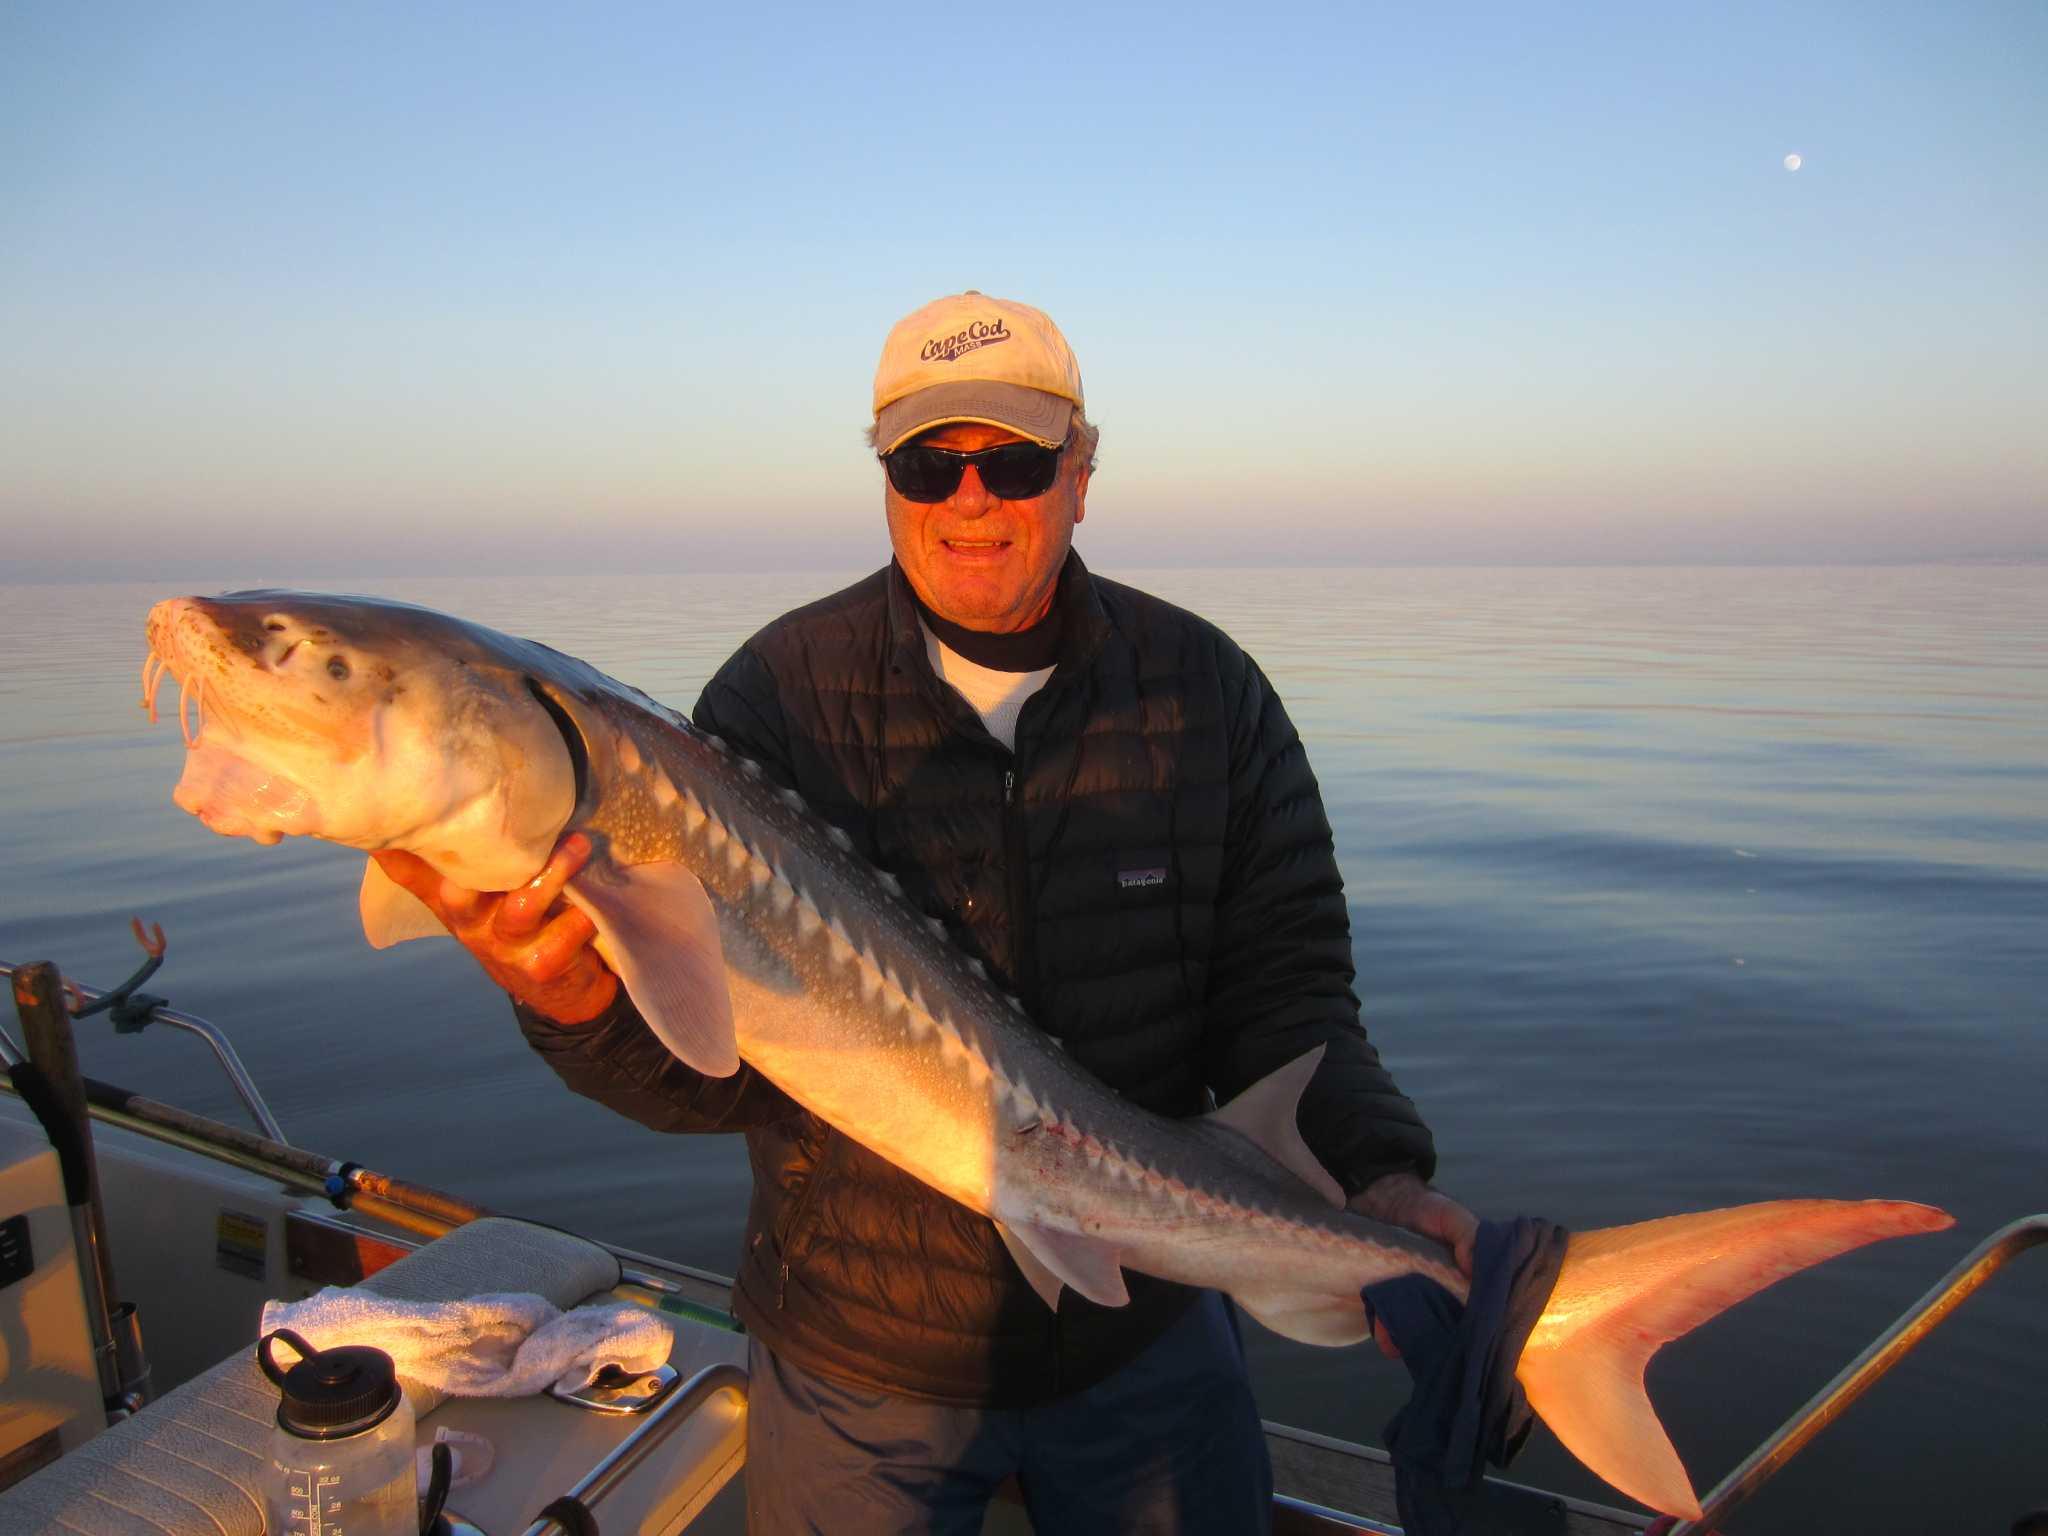 Rains improve bay fishing conditions san francisco chronicle for San francisco fishing